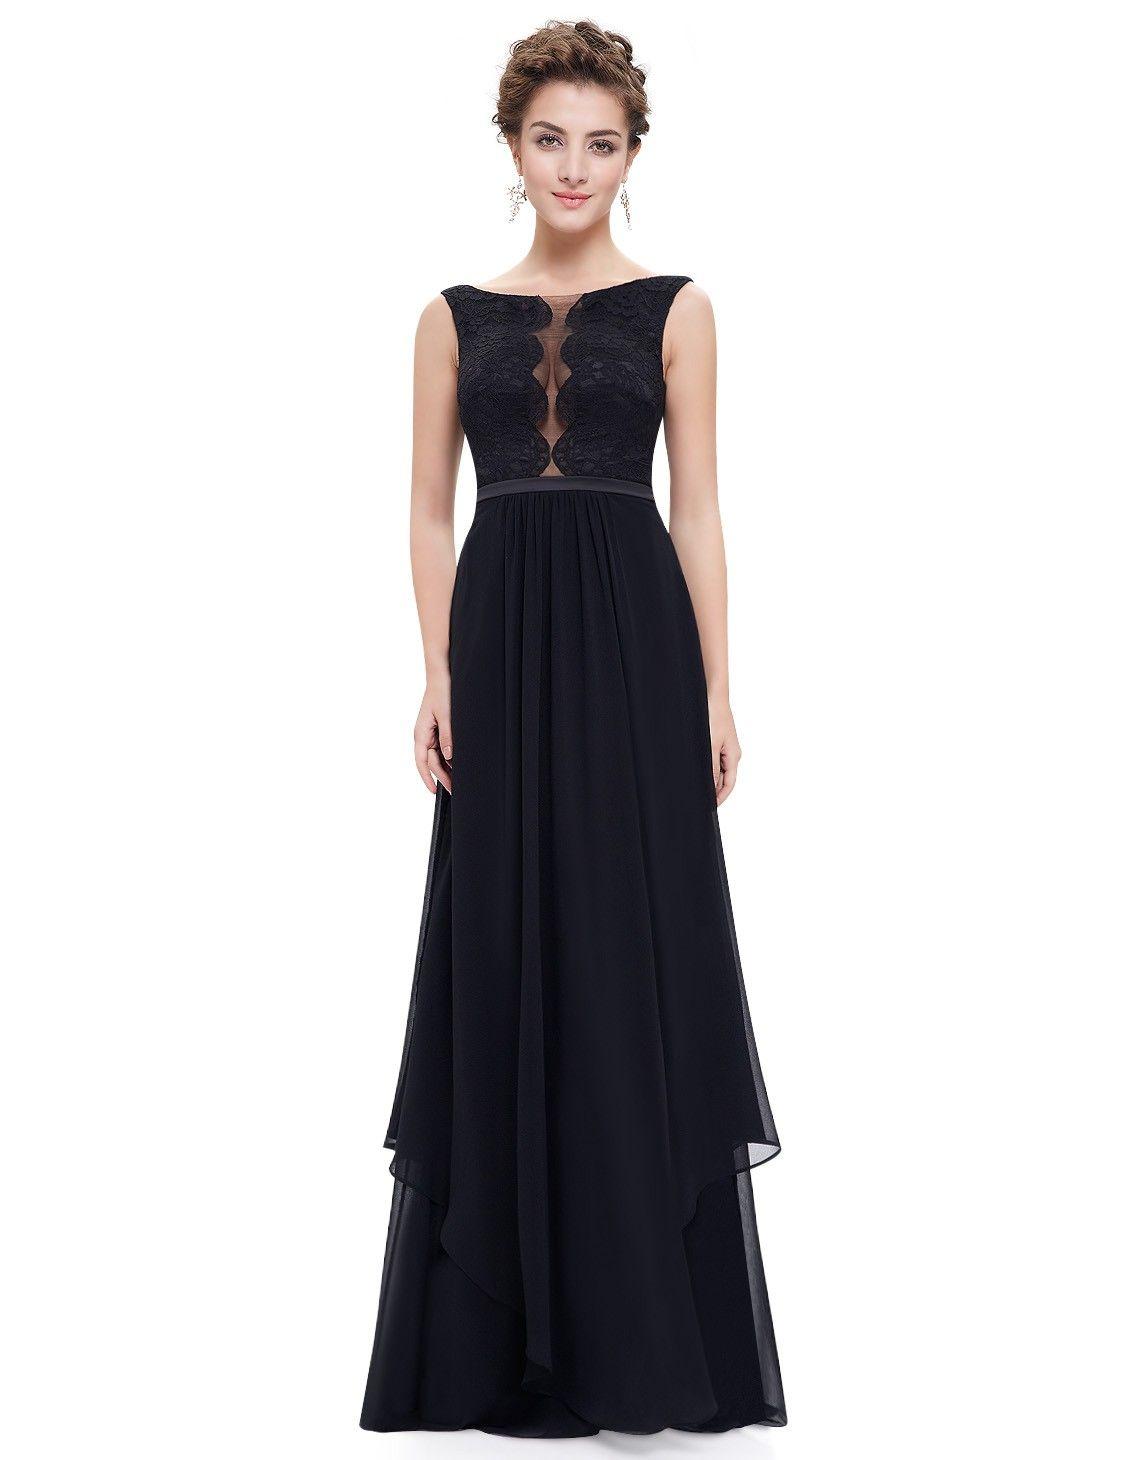 Floor length evening dress with sexy scallop neckline neckline